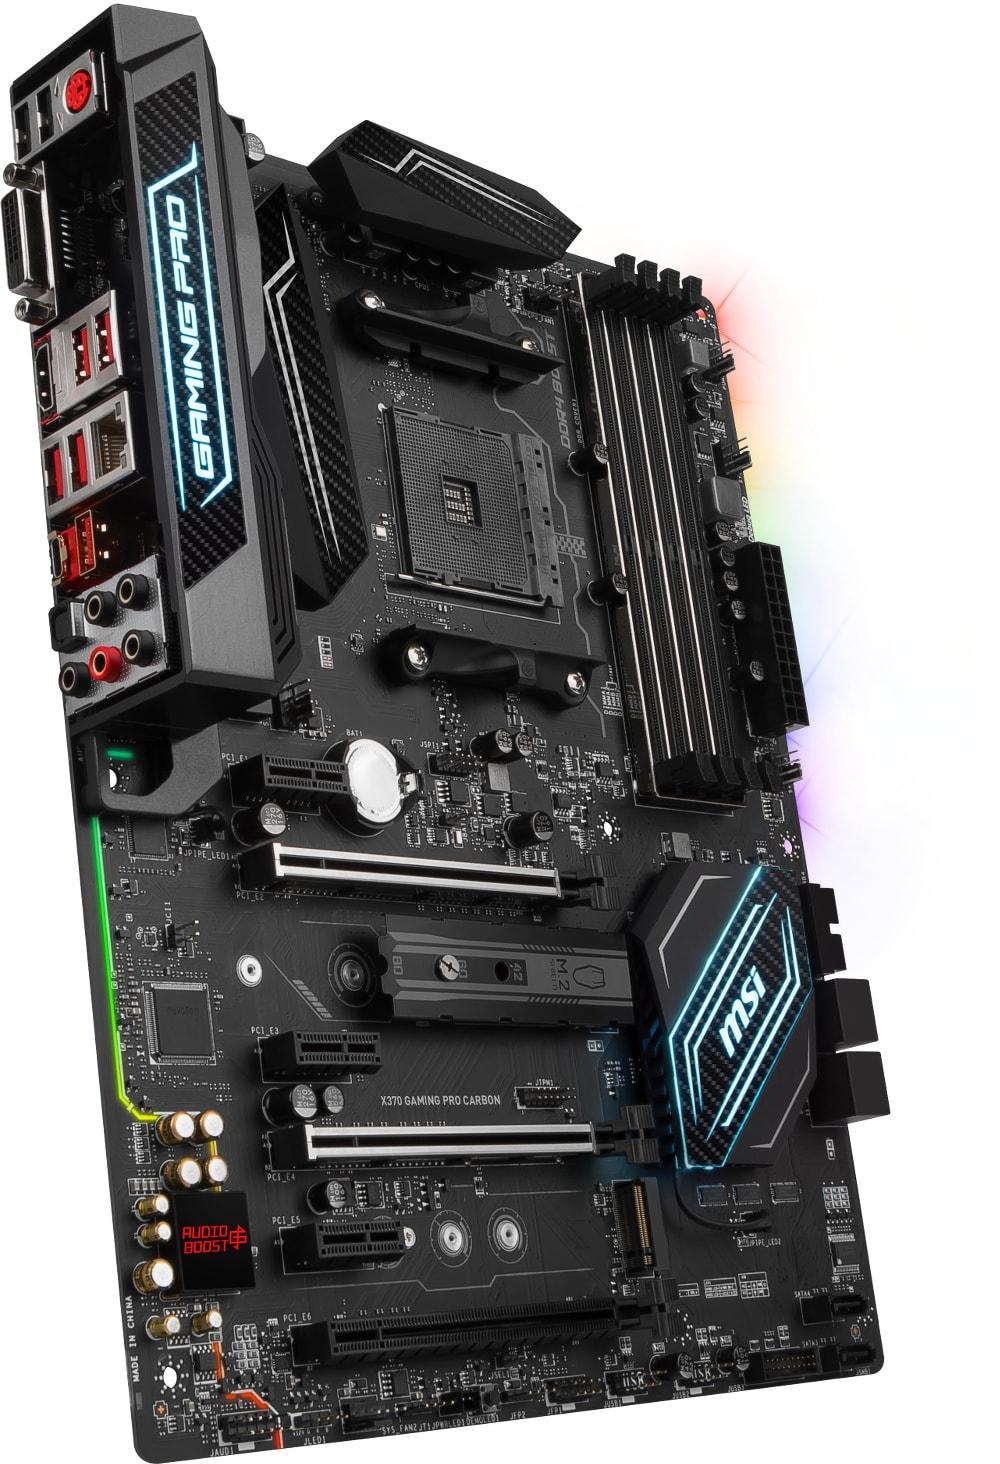 MSI X370 GAMING PRO CARBON ATX DDR4 - Carte mère MSI - Cybertek.fr - 2